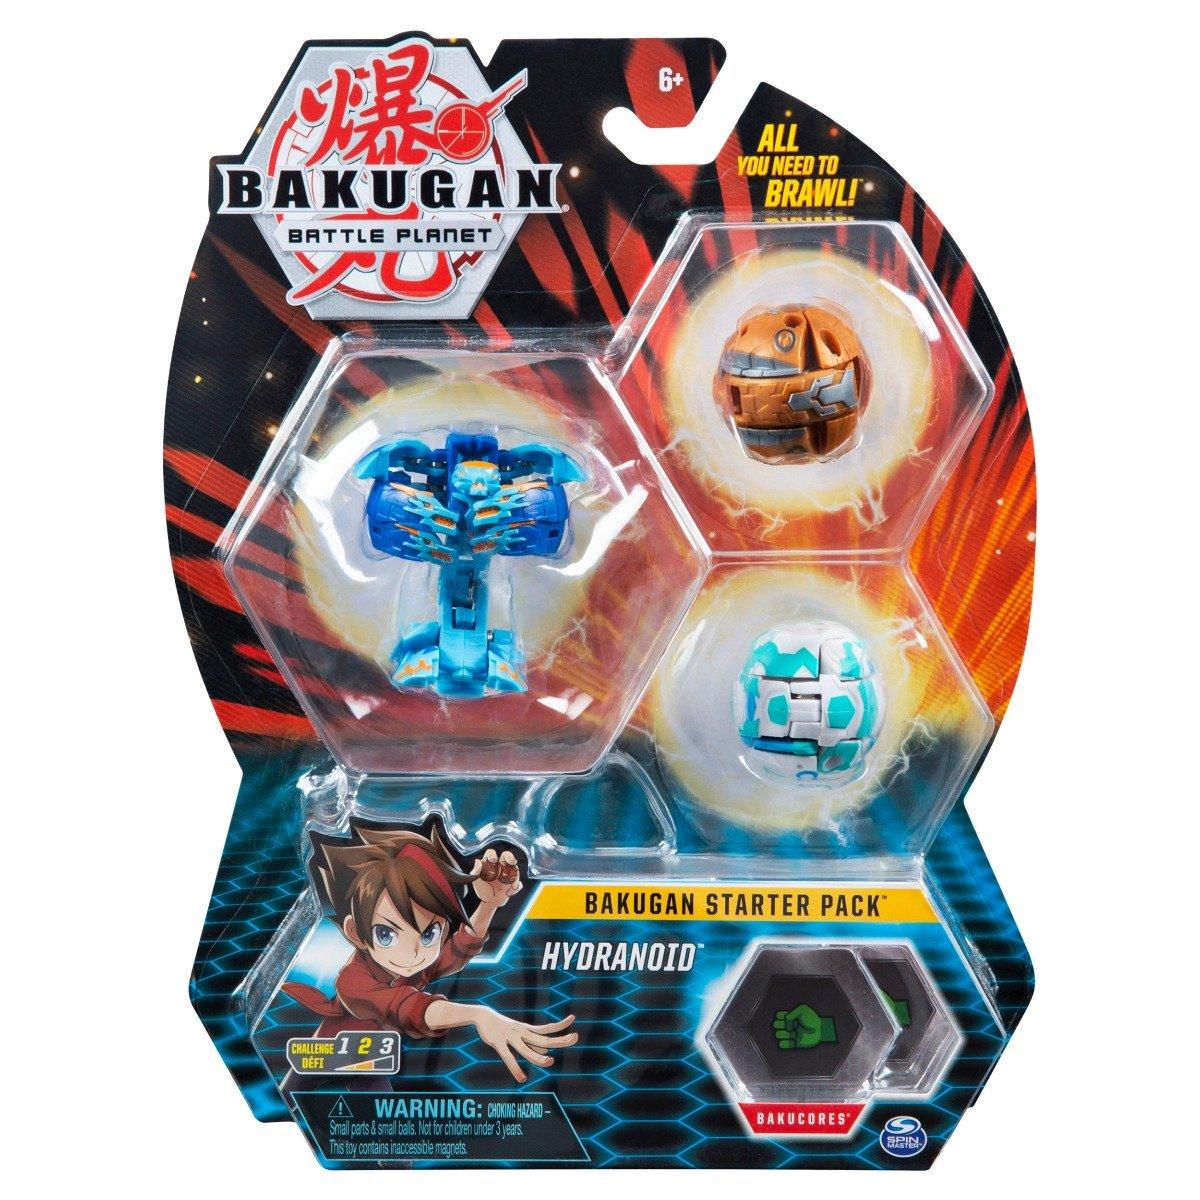 Set Bakugan Battle Planet Starter Pack, Hydranoid, 20118471